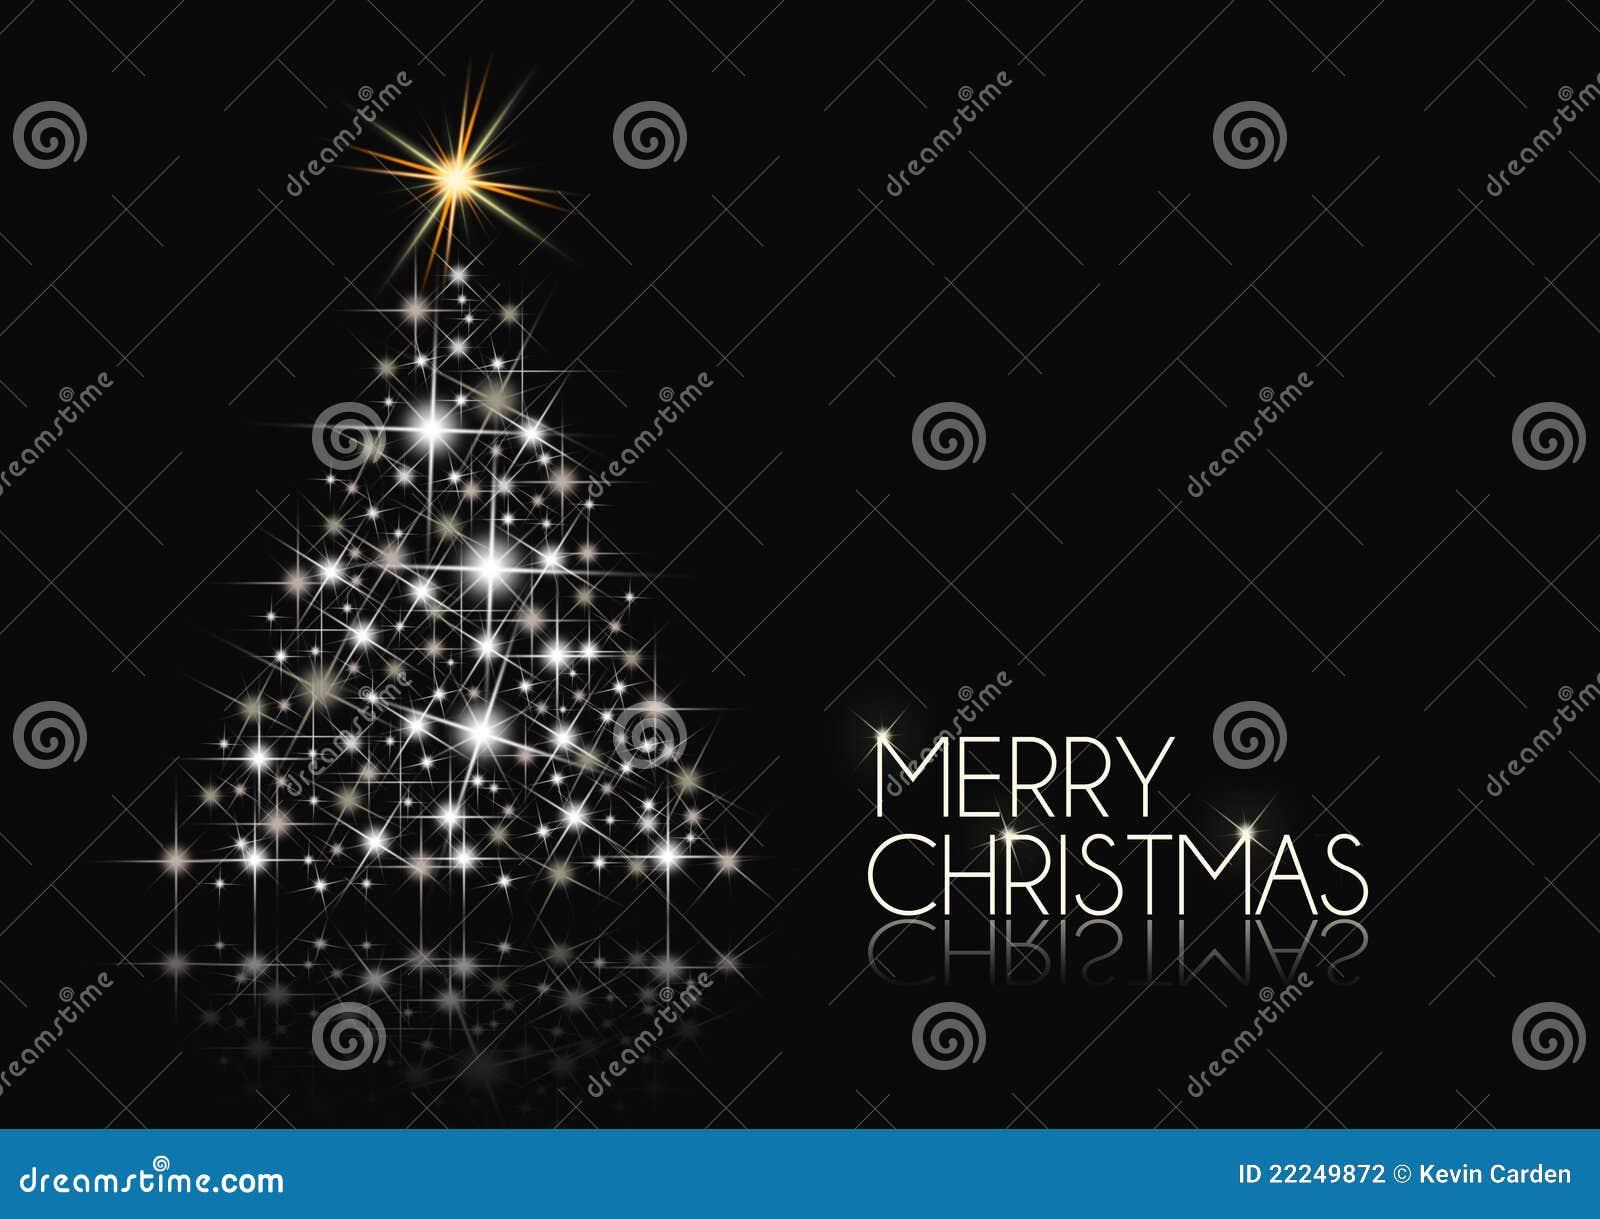 Black And White Christmas Stock Illustration Illustration